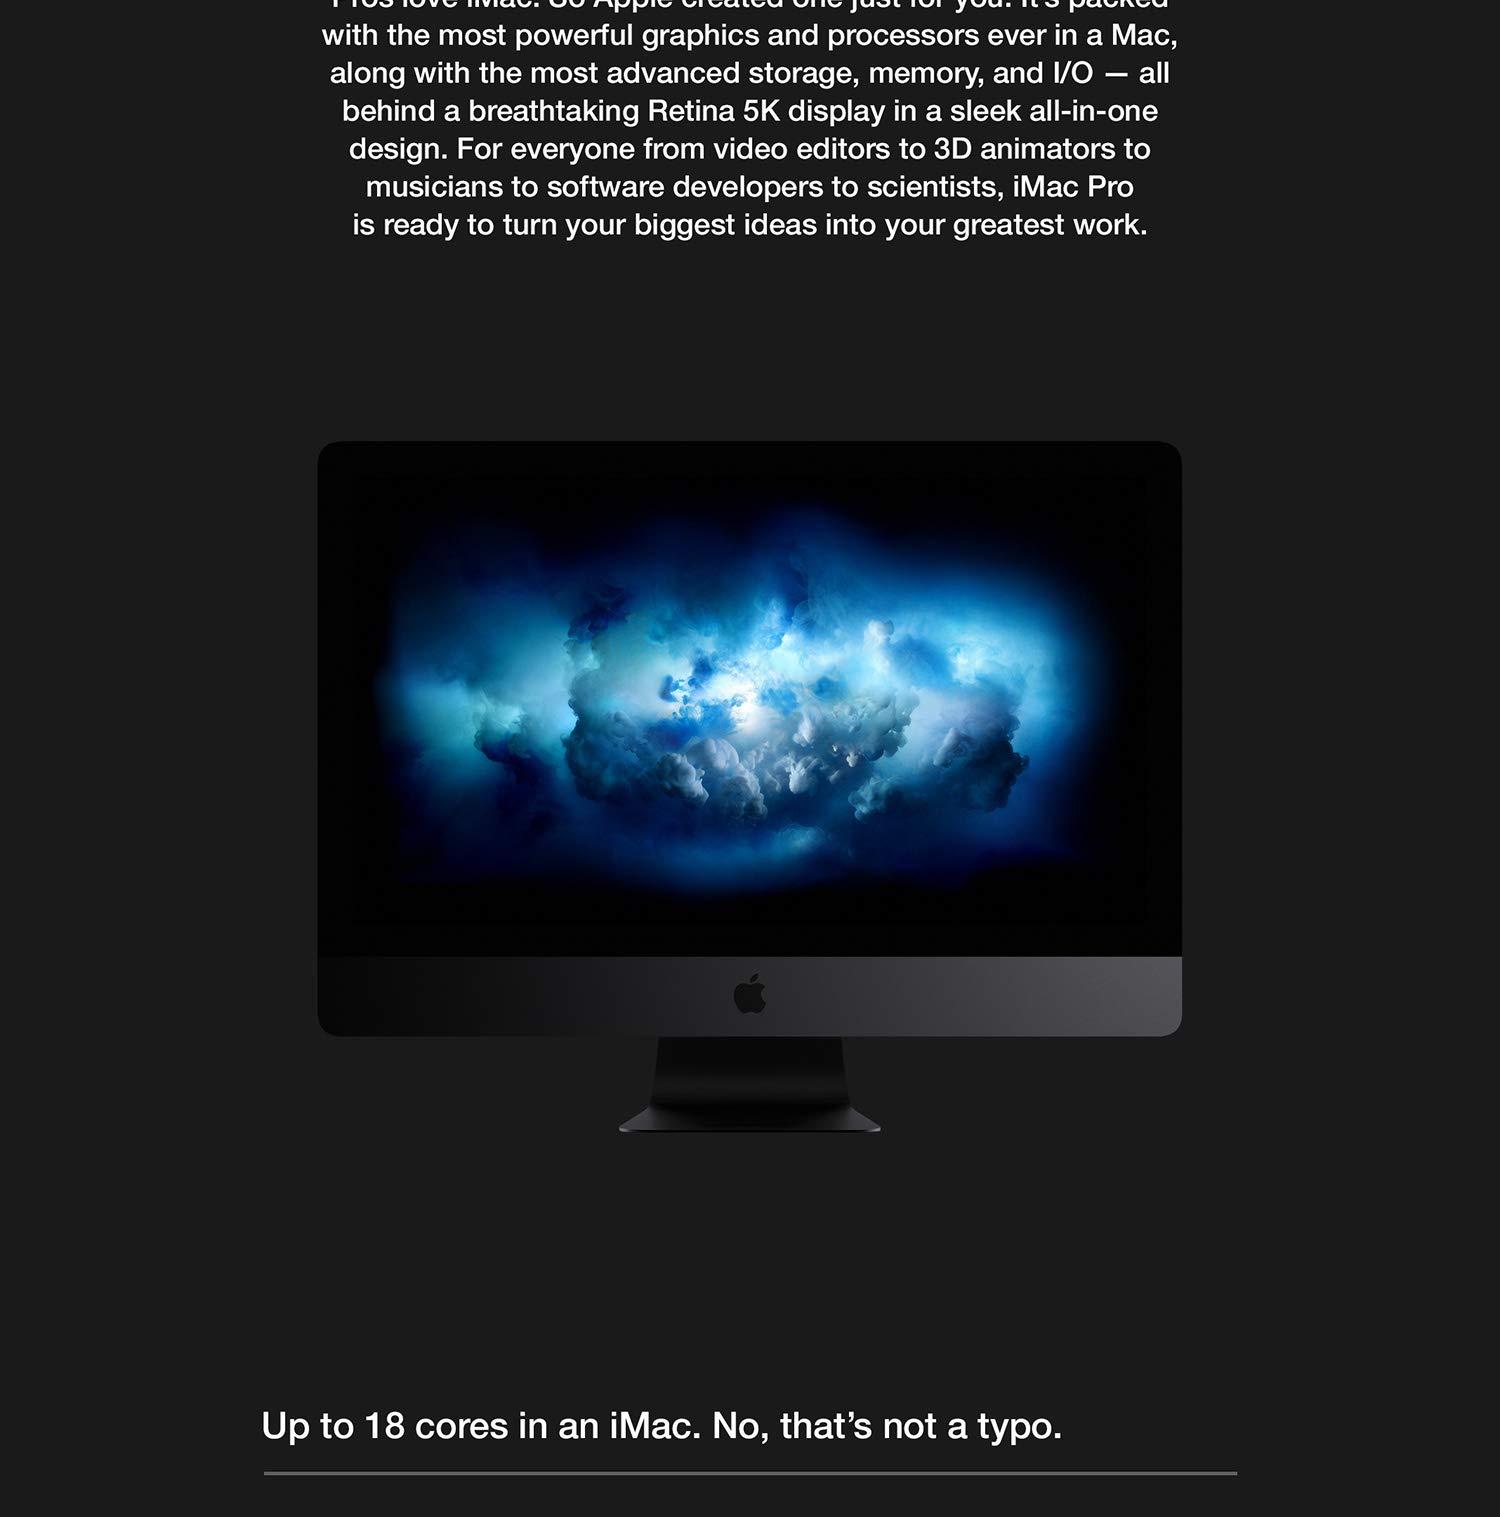 Apple iMac Pro (27-inch Retina 5K display, 3 2GHz 8-core Intel Xeon W, 32GB  RAM, 1TB SSD) - Space Gray